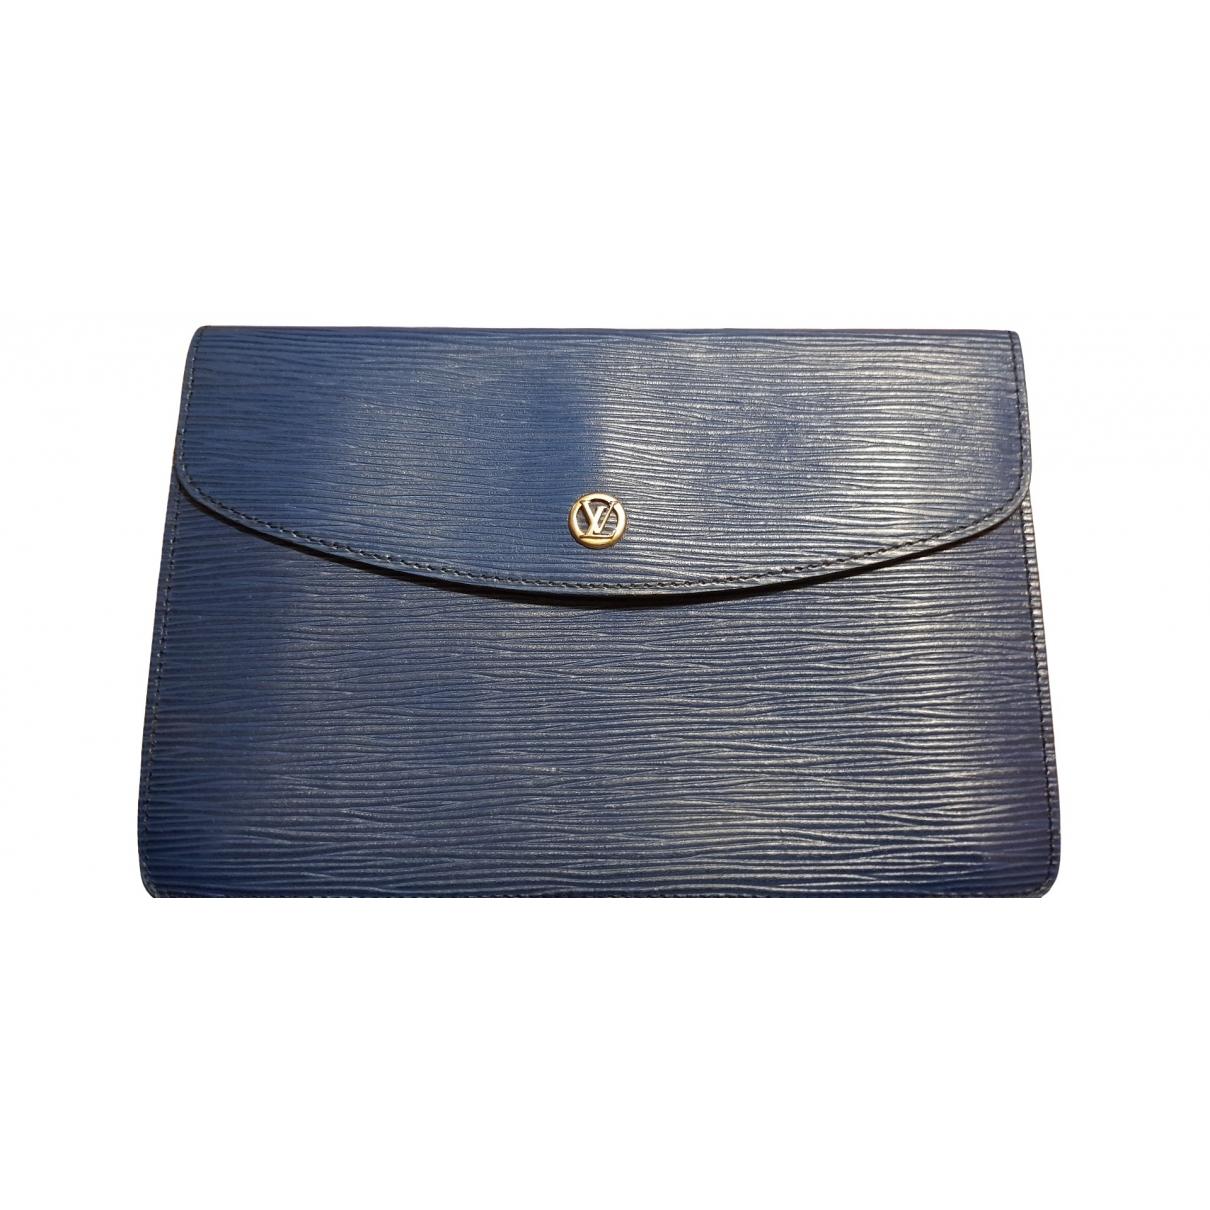 Louis Vuitton \N Blue Leather Clutch bag for Women \N